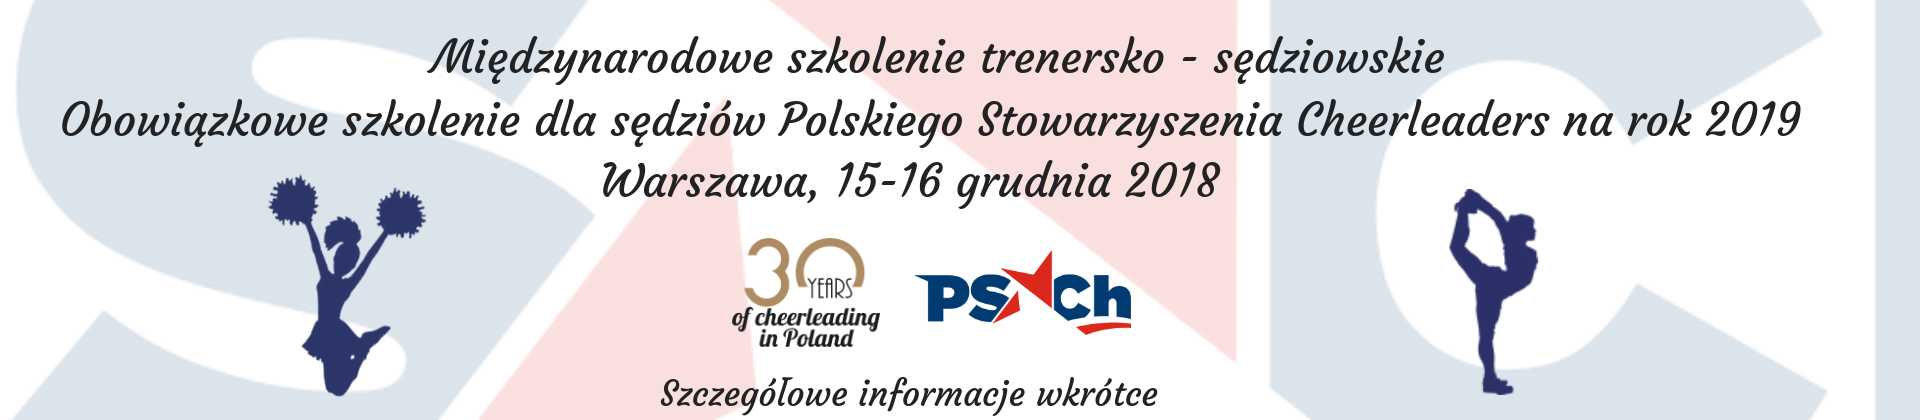 Grand Prix Polski Cheerleaders 2018